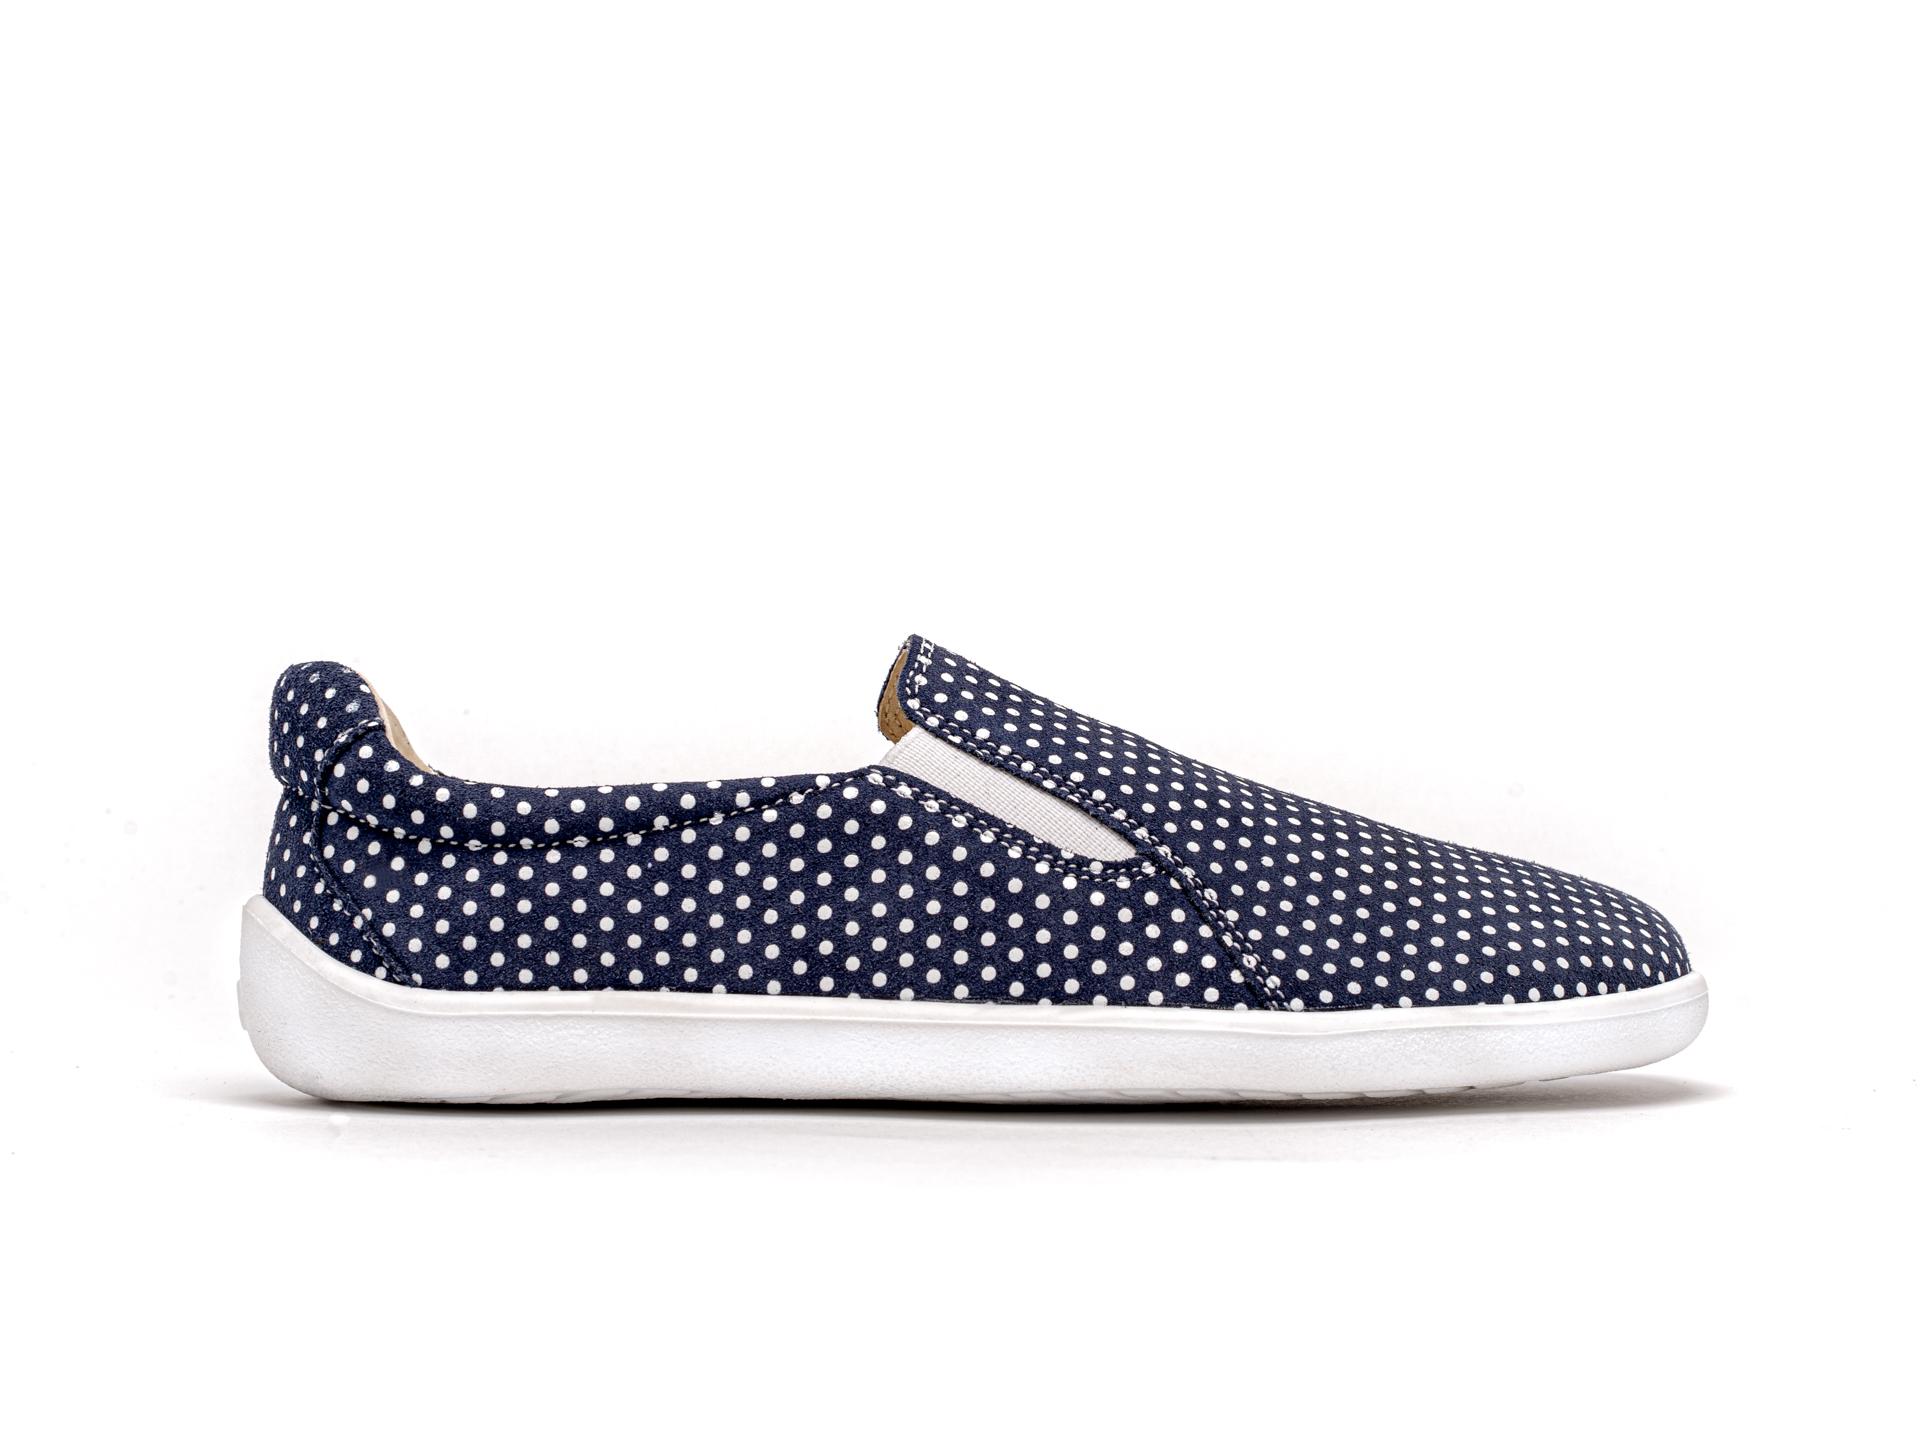 Barefoot Be Lenka Eazy - Dark Blue with Dots 46